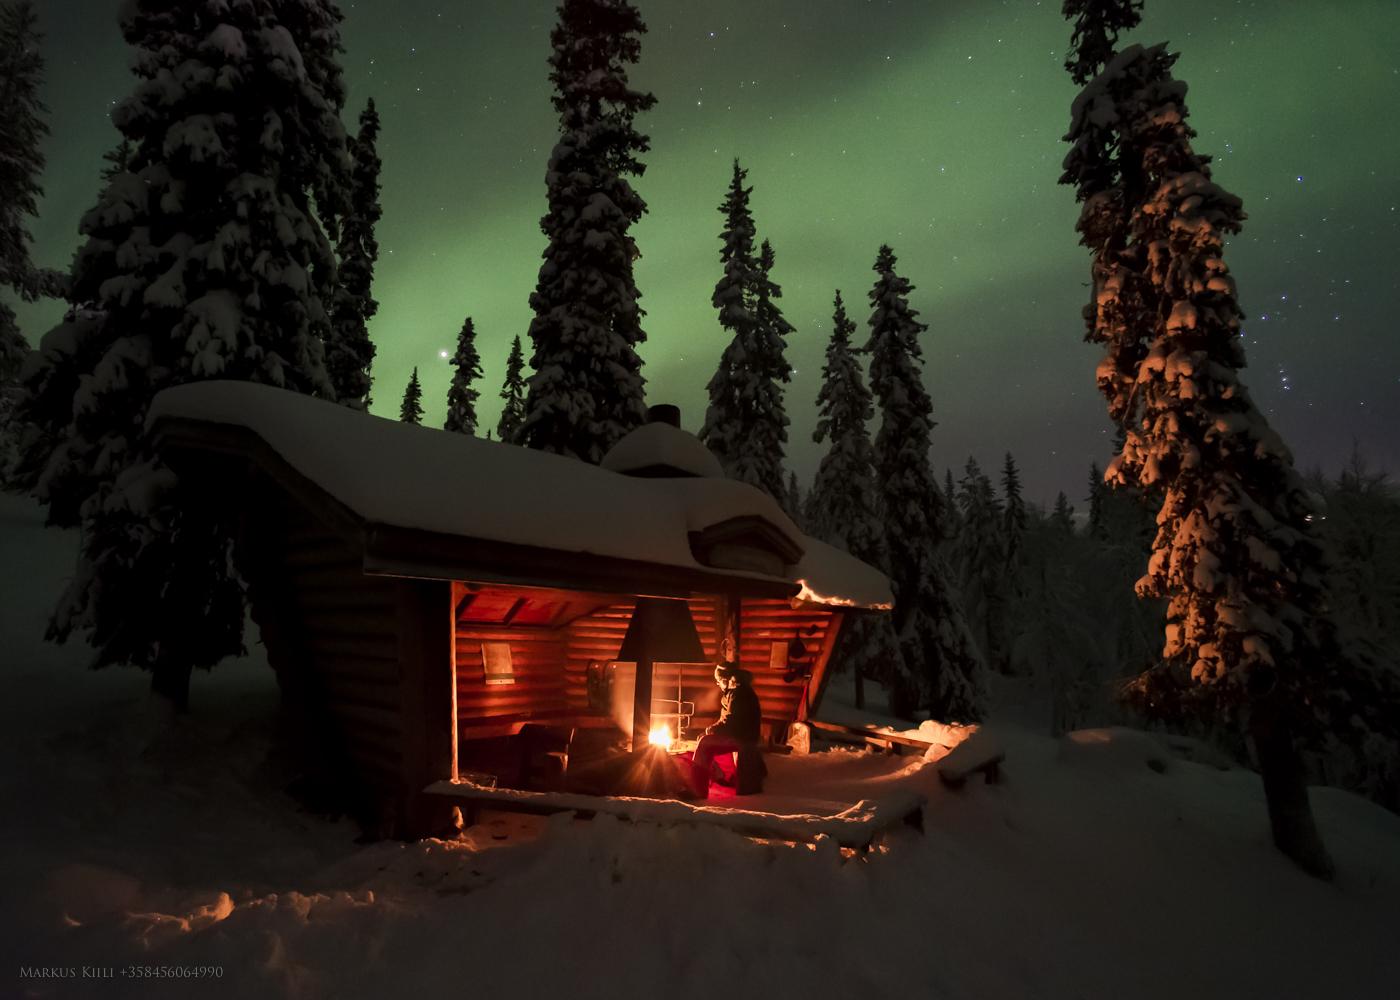 Aurora Borealis at Varkaankuru